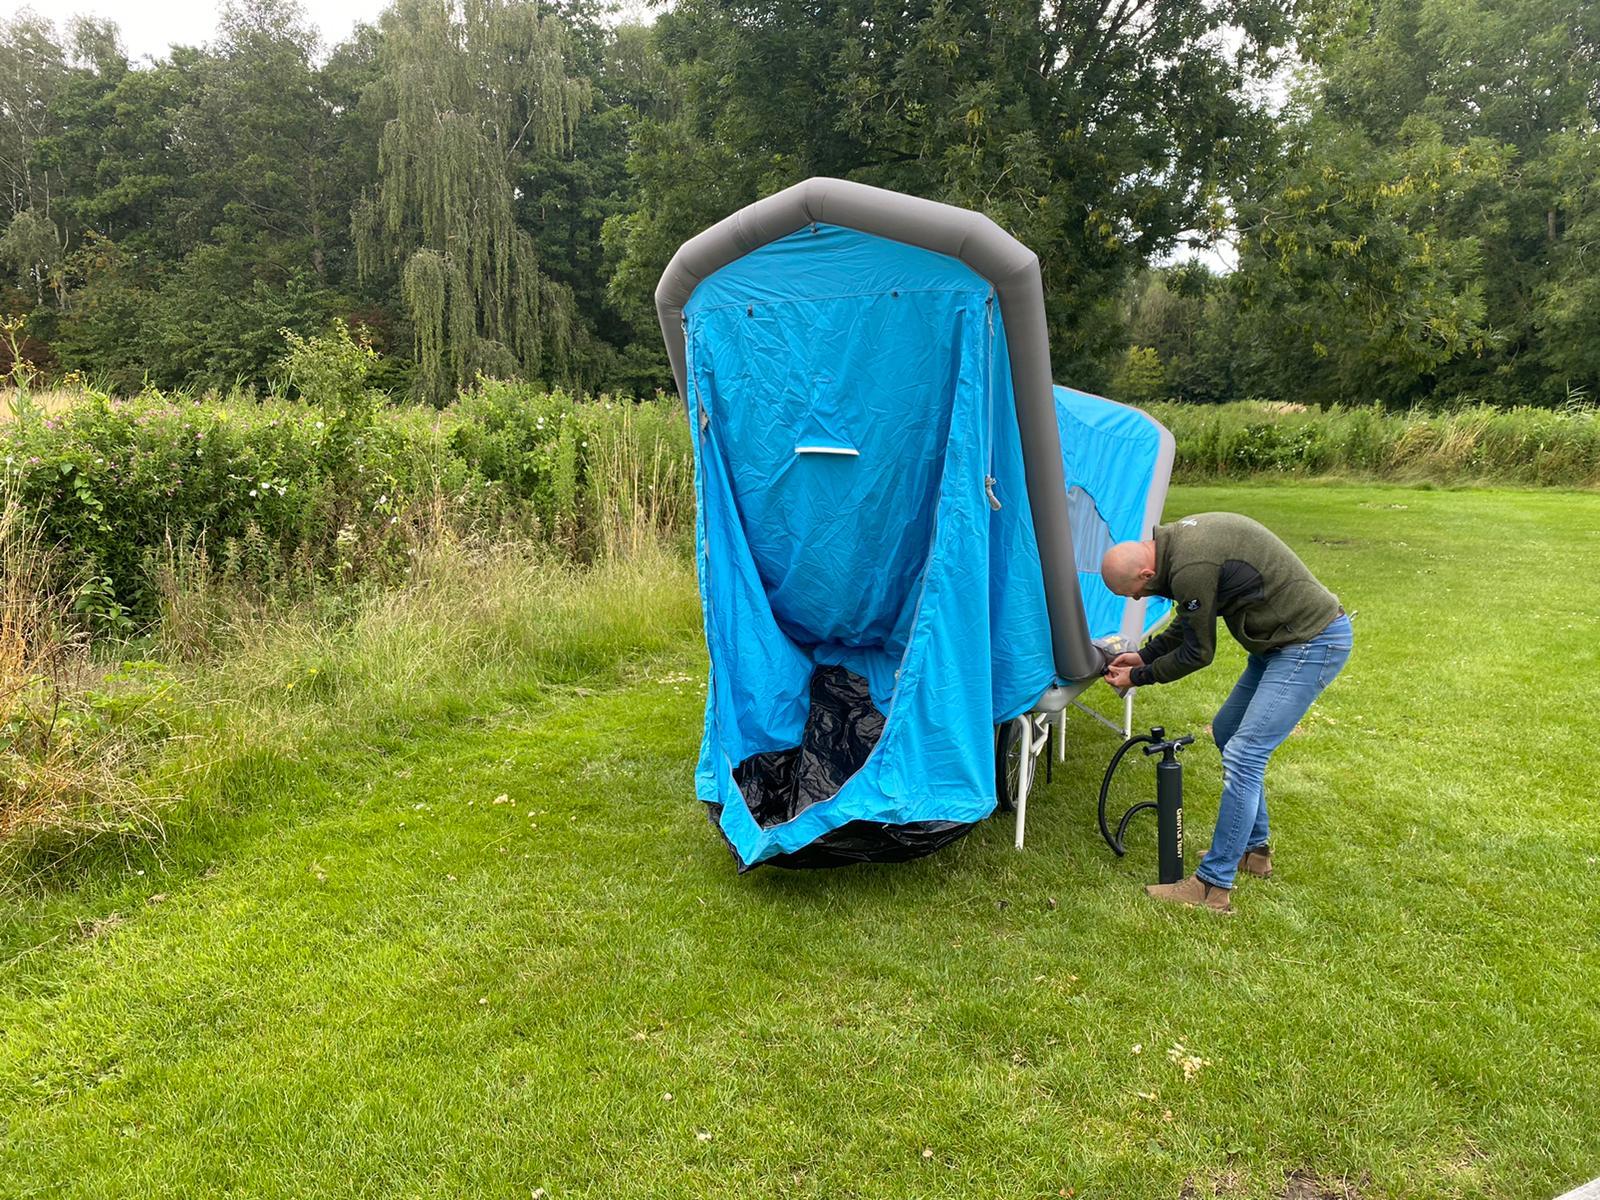 Reisverslag soci.bike met B-Turtle tent